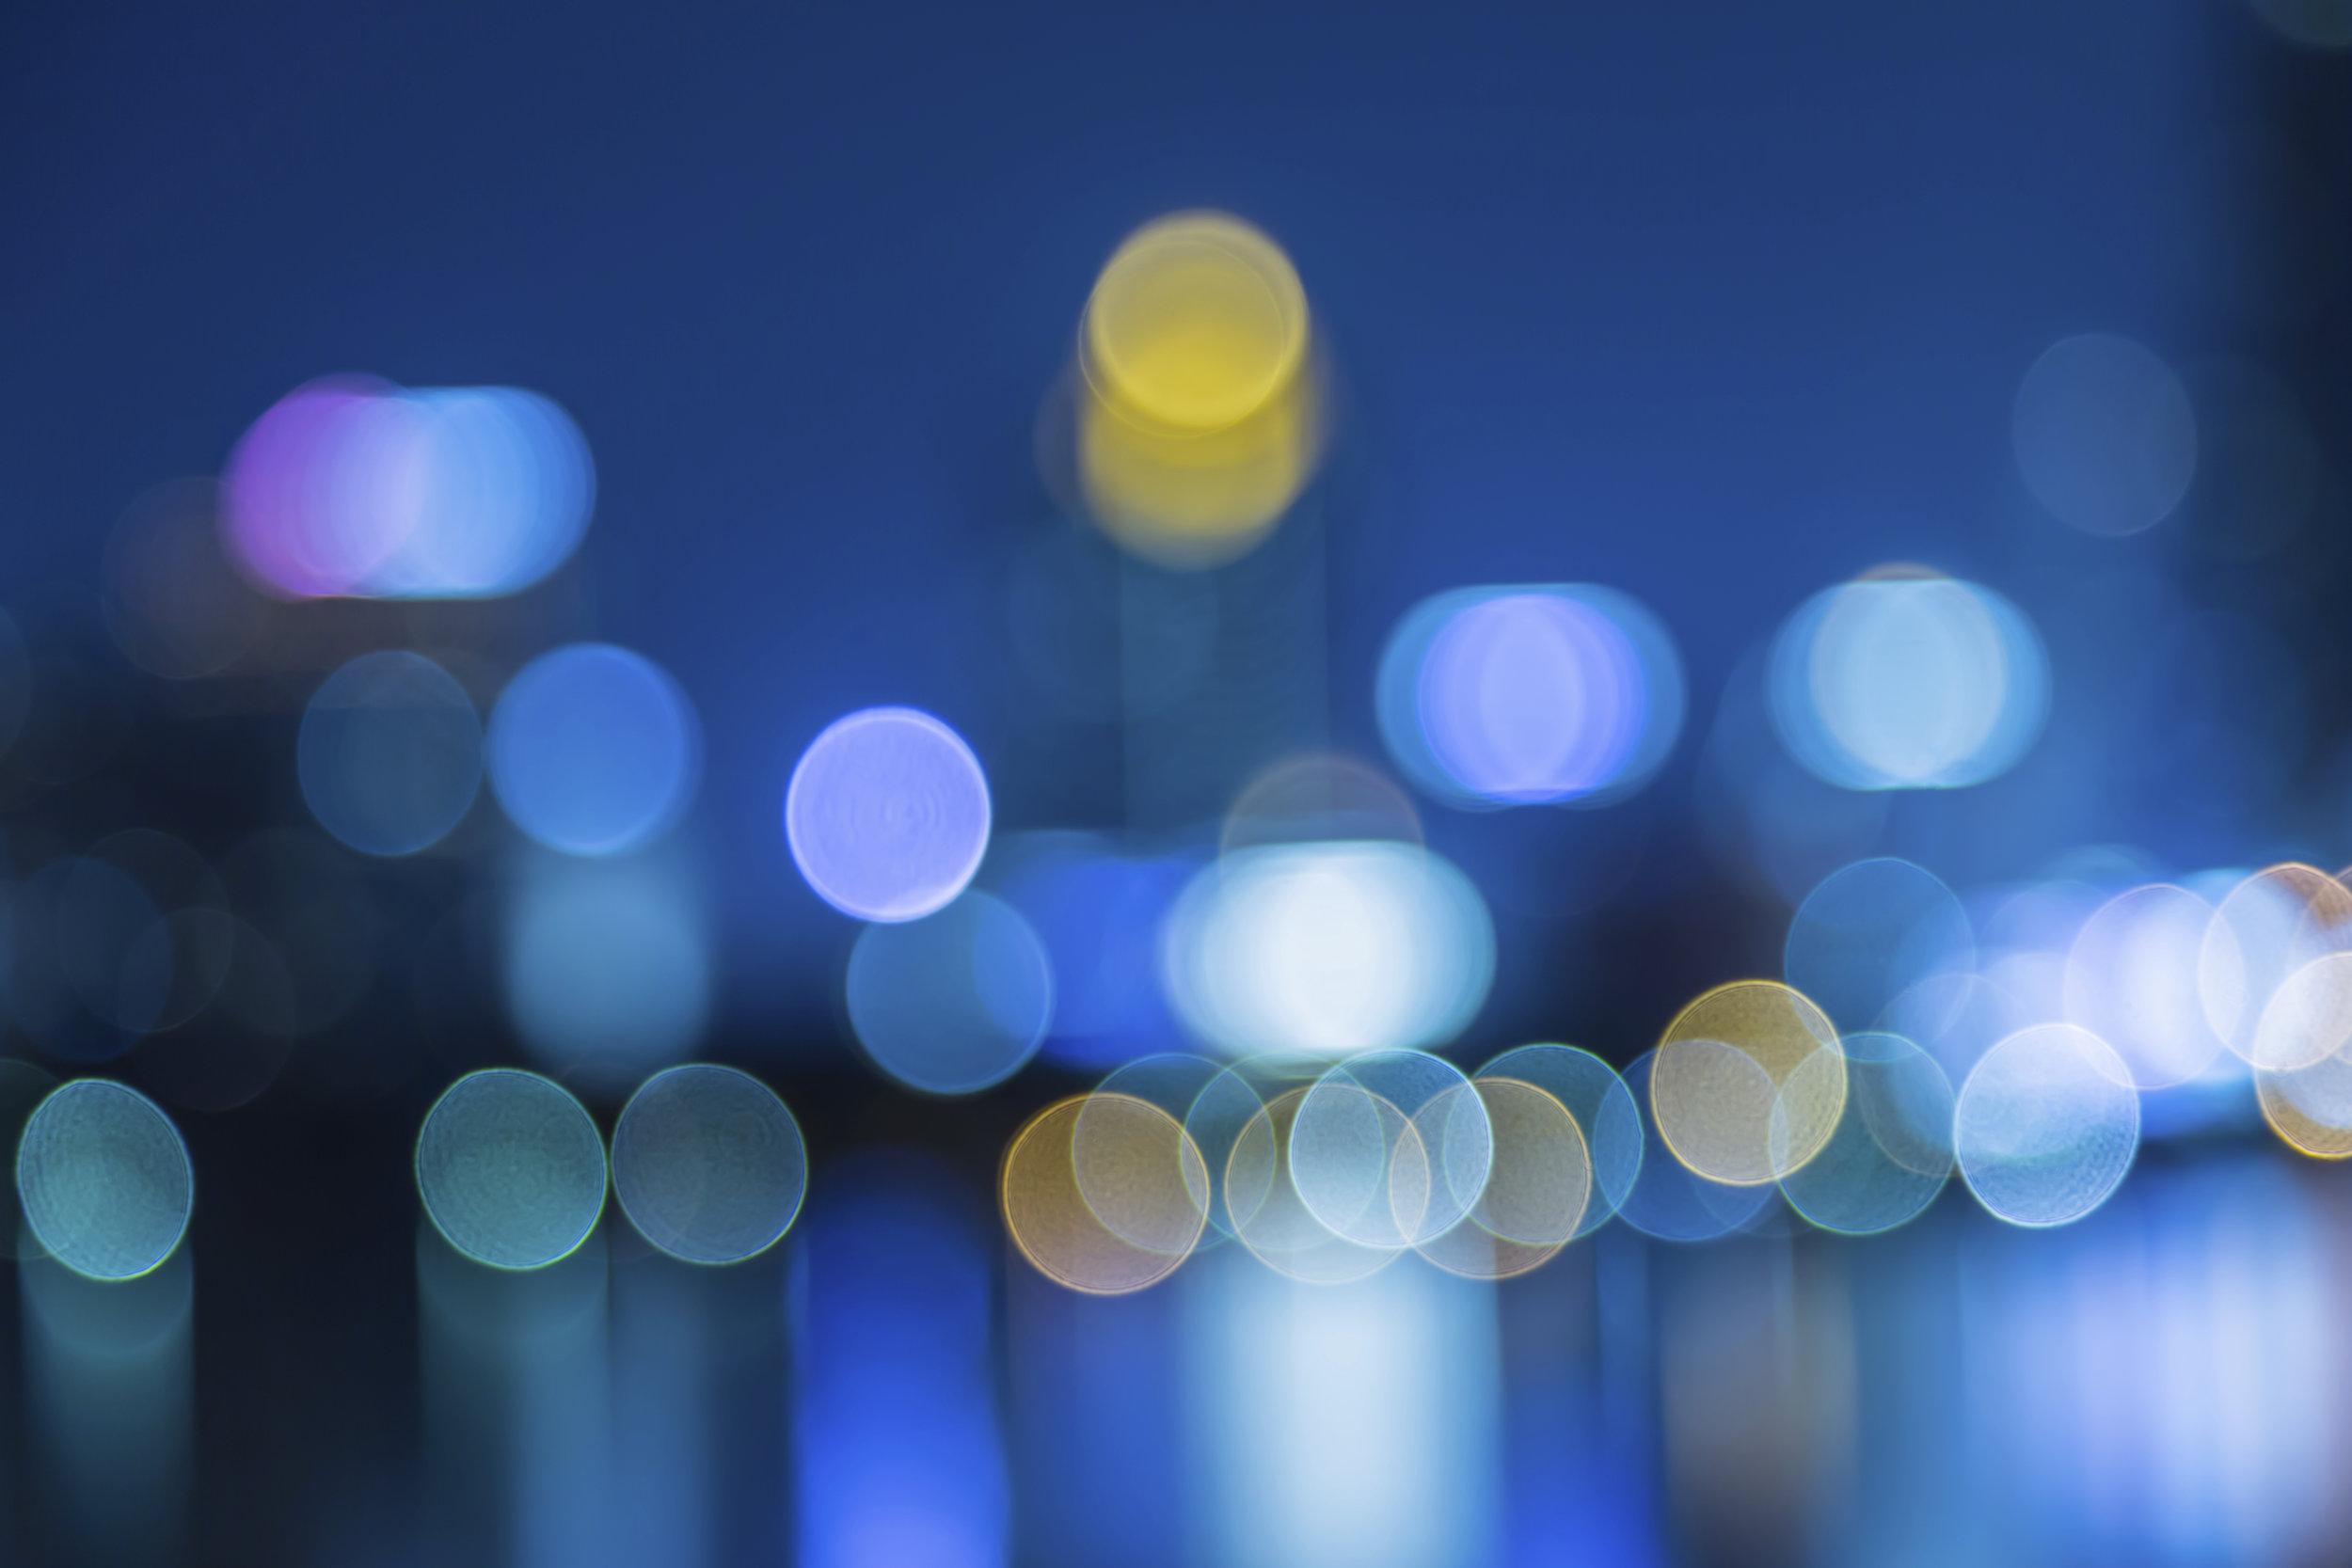 Abstract,-night-cityscape-light-blur-bokeh,-defocused-background-000048922706_Double.jpg